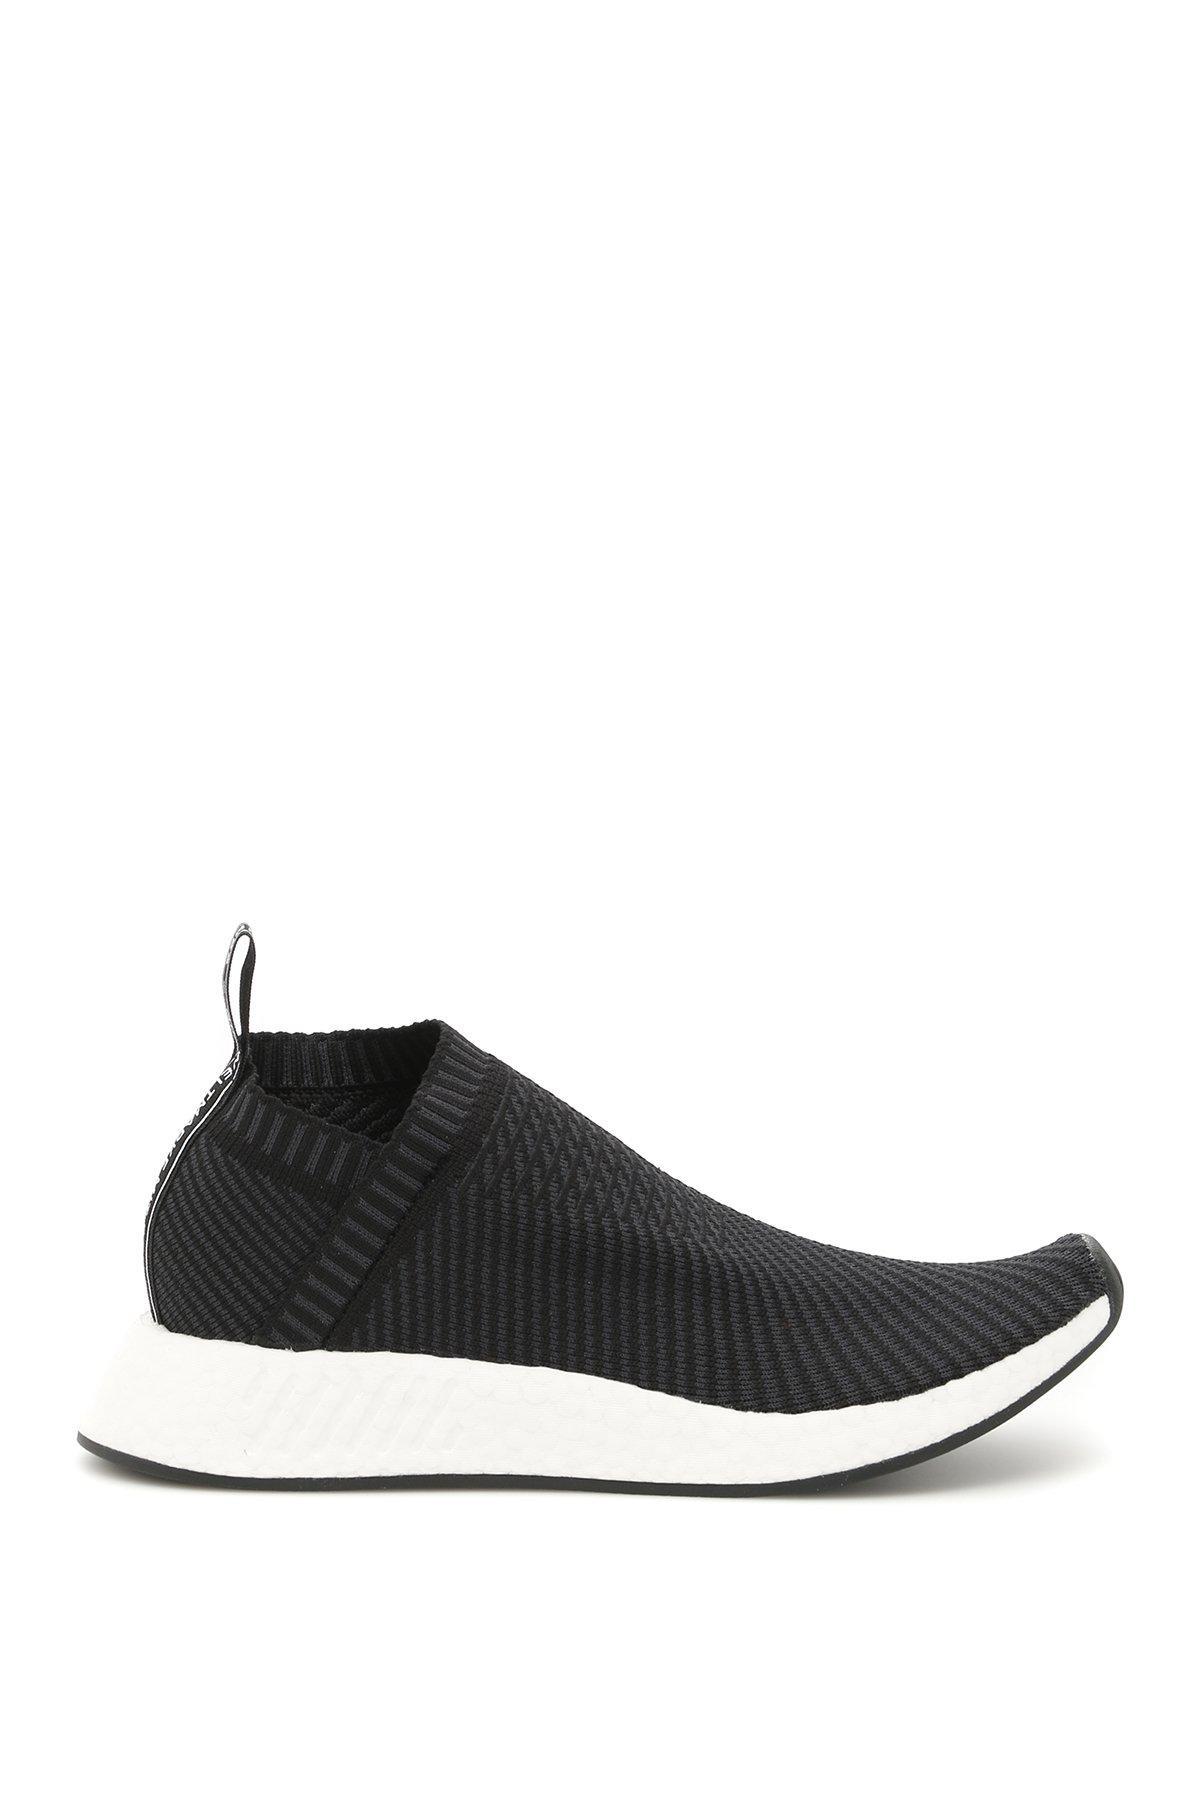 8e85cbf6d Adidas Originals Adidas Nmd Cs2 Primeknit Sneakers In Blue. CETTIRE